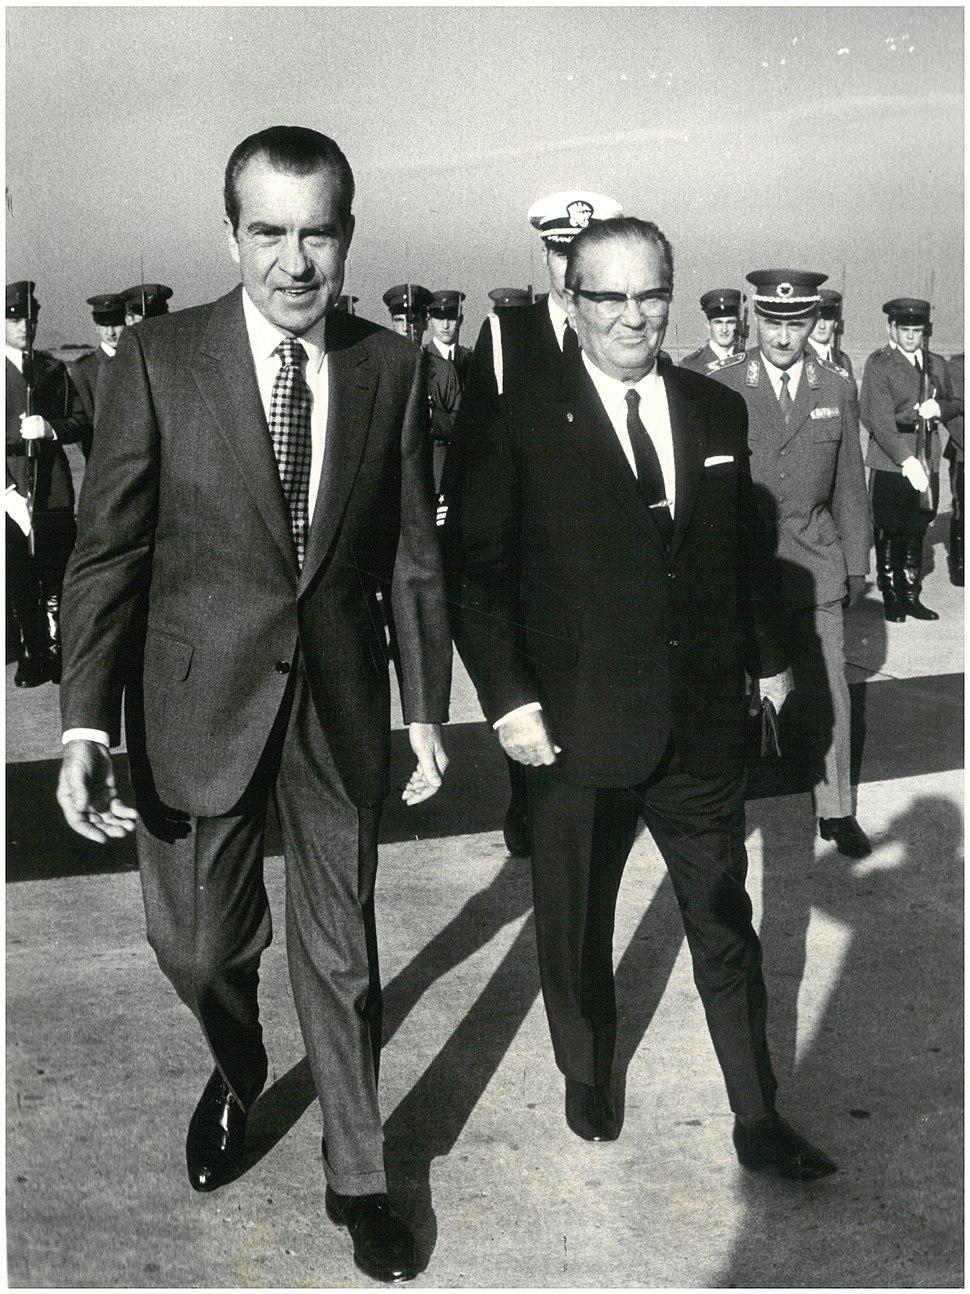 Stevan Kragujevic, Ricard Nikson i Tito, 30 sept 1970 )